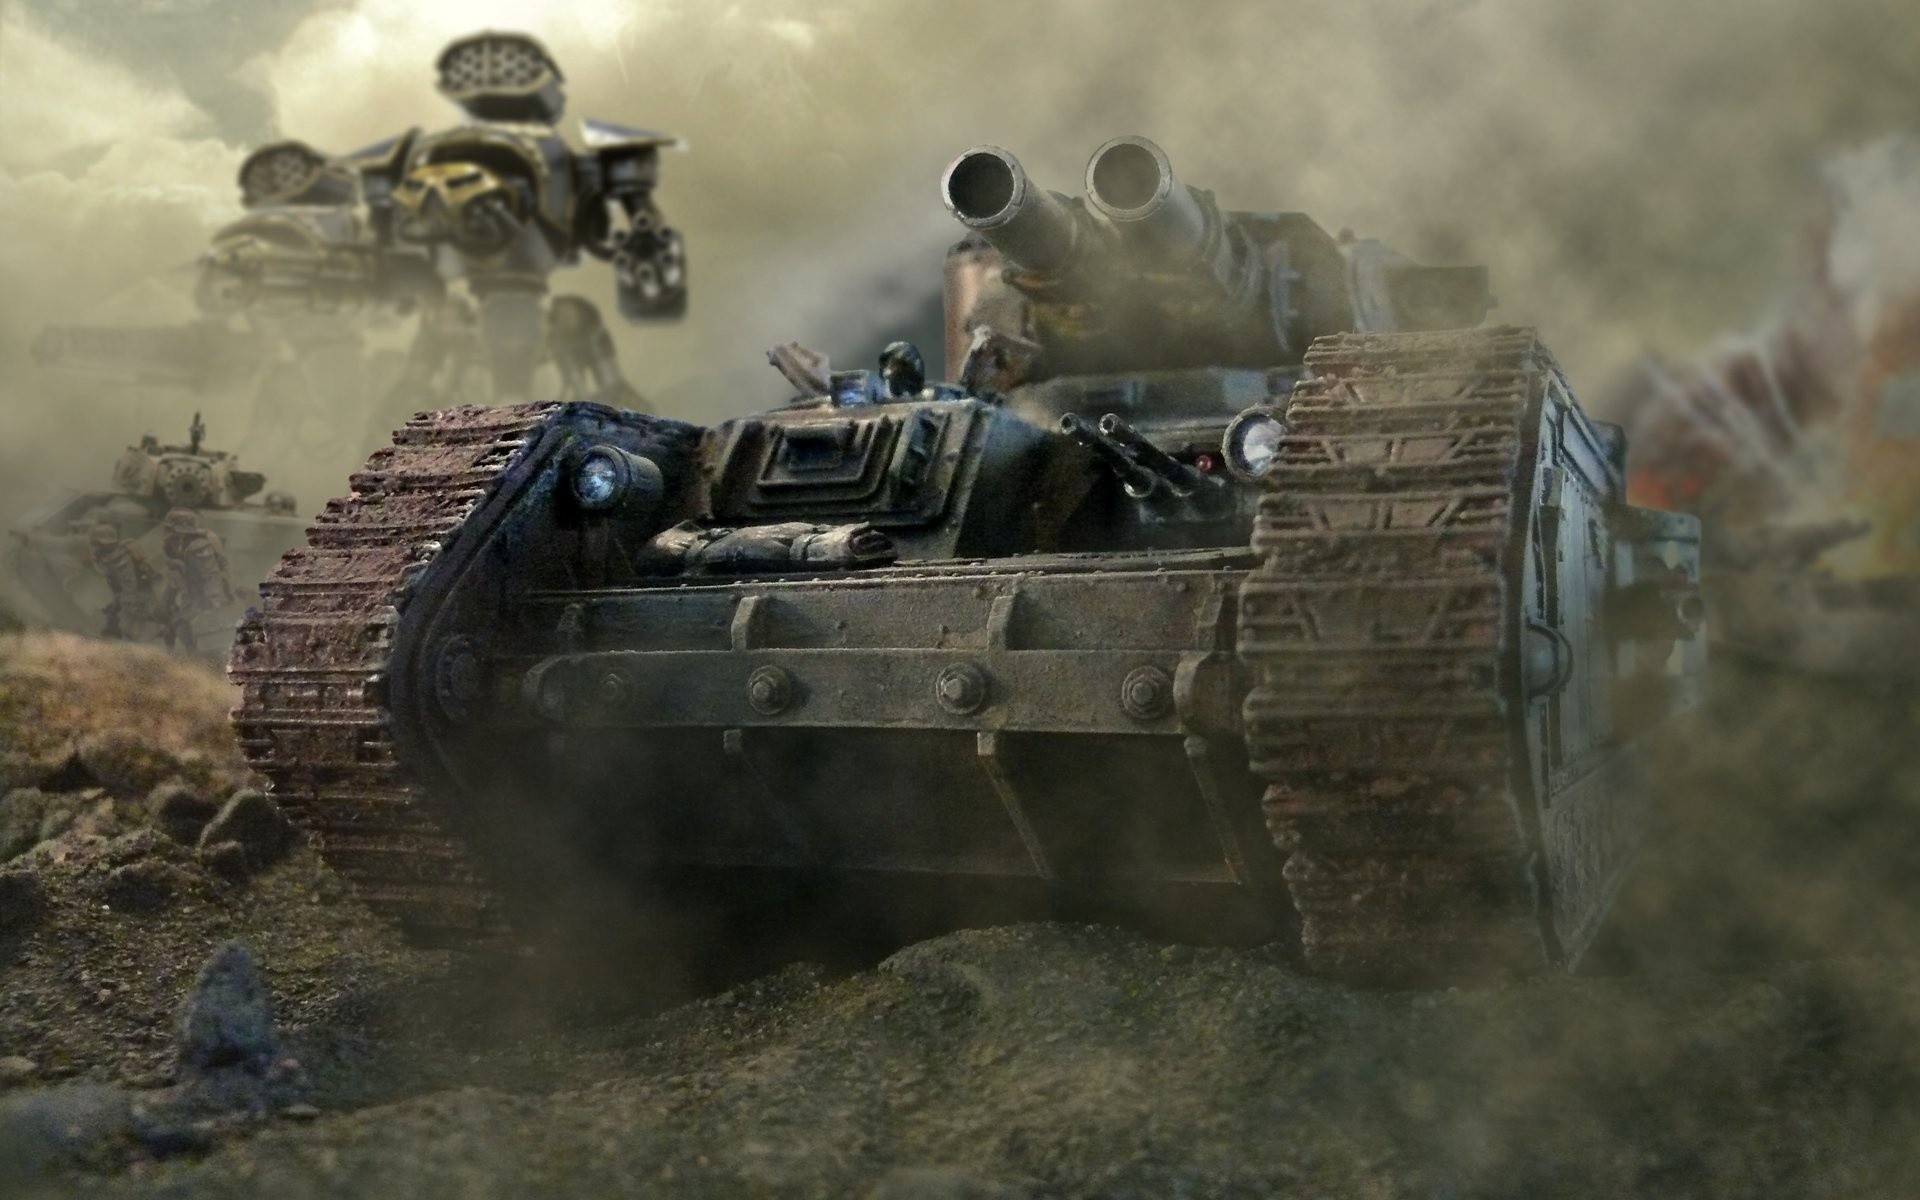 War warhammer warhammer 40k chaos space marines titan tanks terran tabletop  orks last stand waagh wallpaper | | 10895 | WallpaperUP